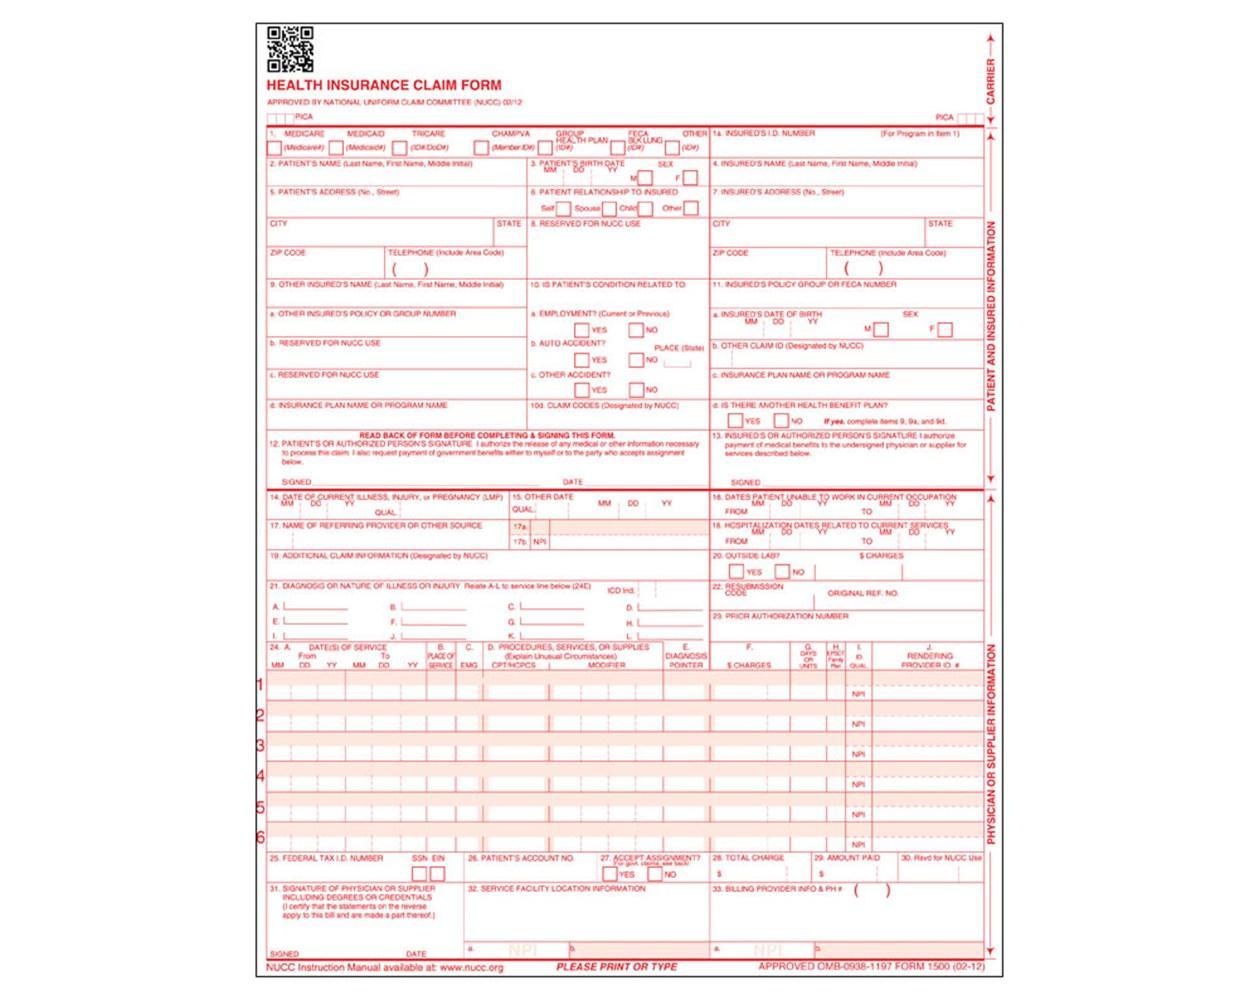 Claim Form Hcfa 1500